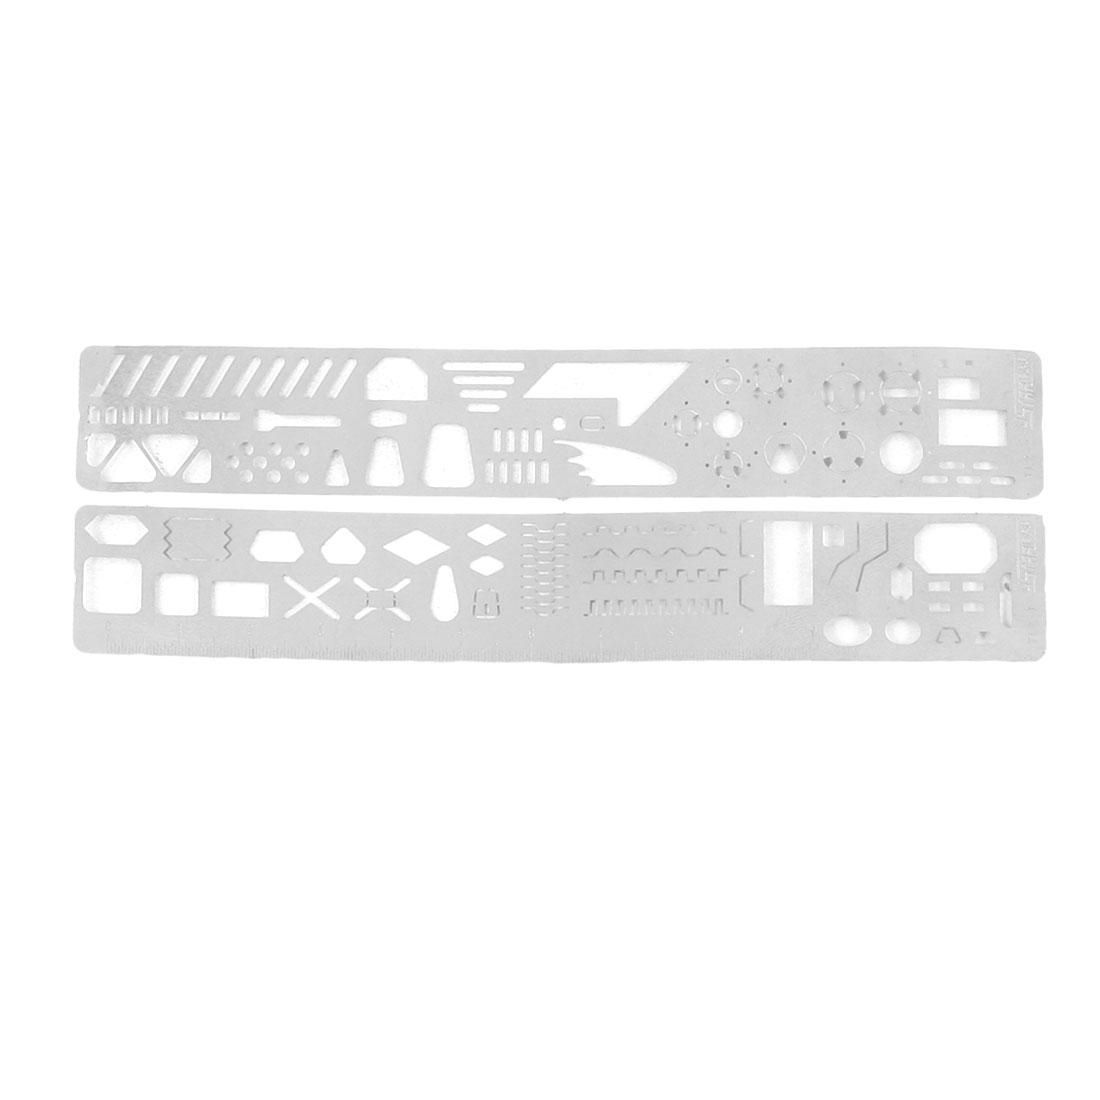 2 Pcs UA-90035 Metal Modeling Tool Set Scriber Forming Block